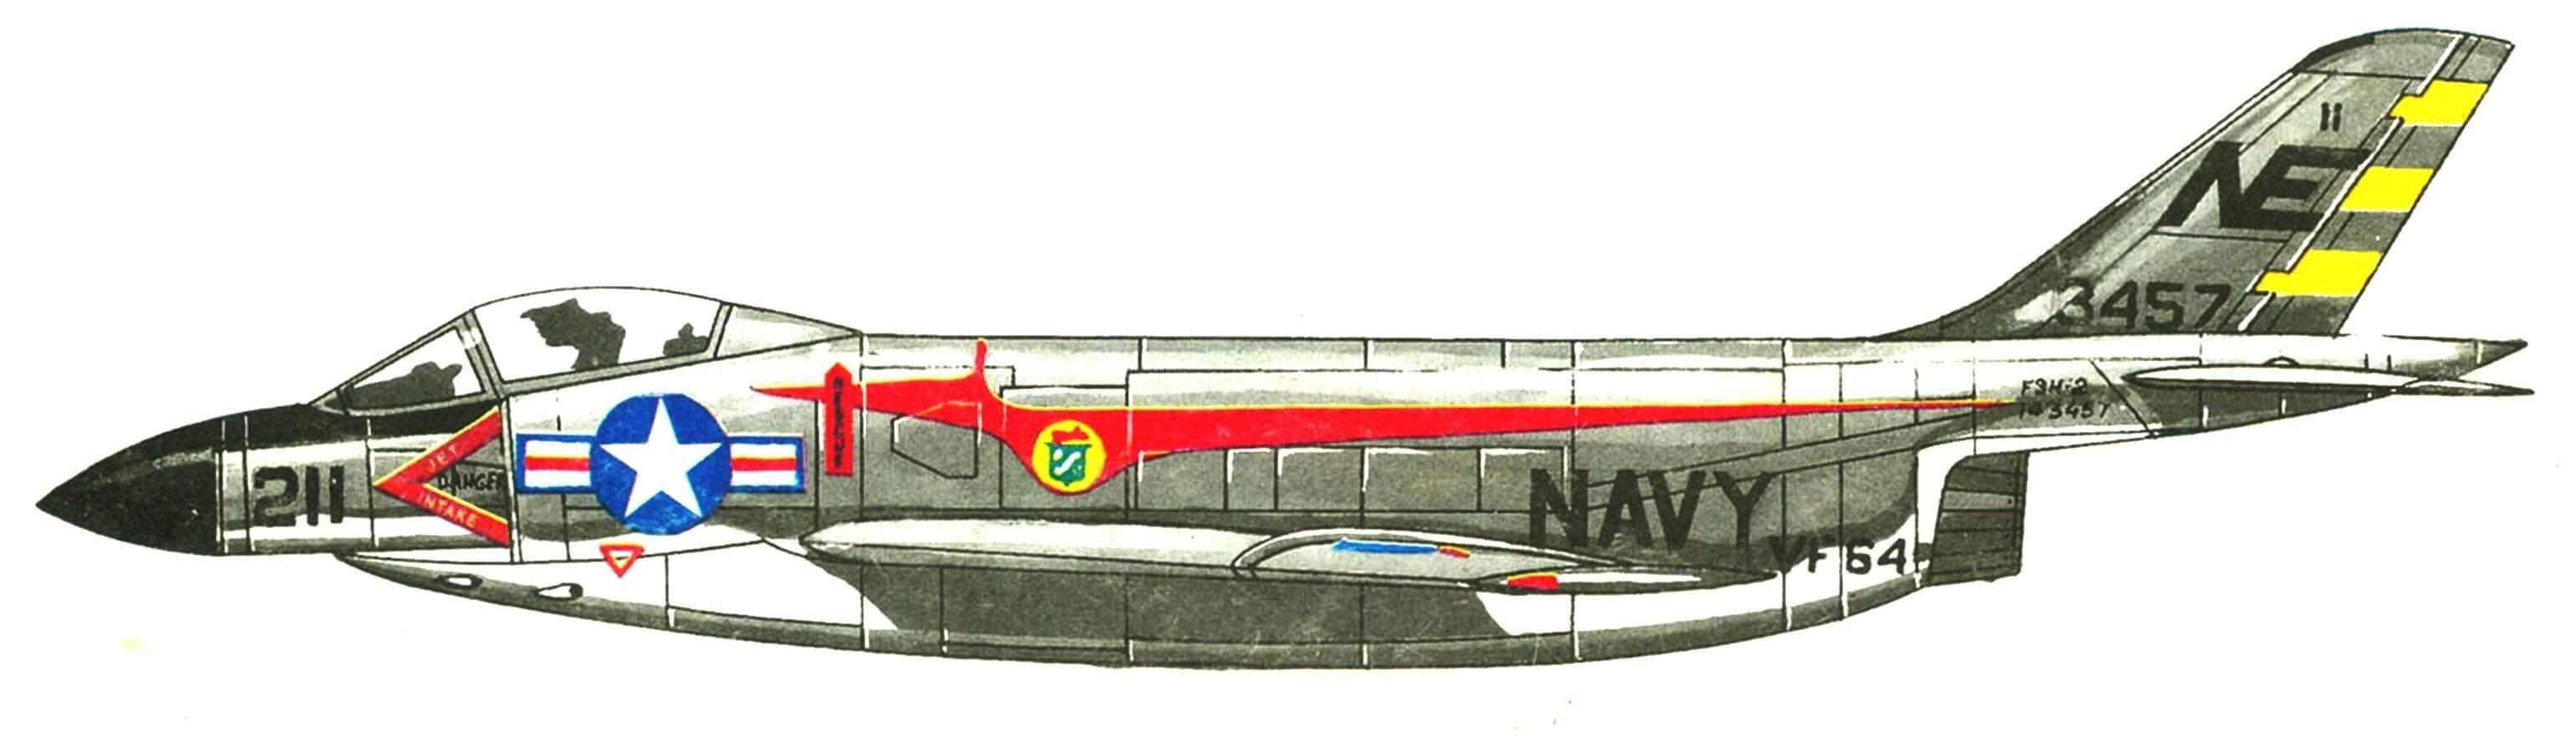 F-3В эскадрильи VF-64 «Freelancers» авианосец «Midway», 1958 г.